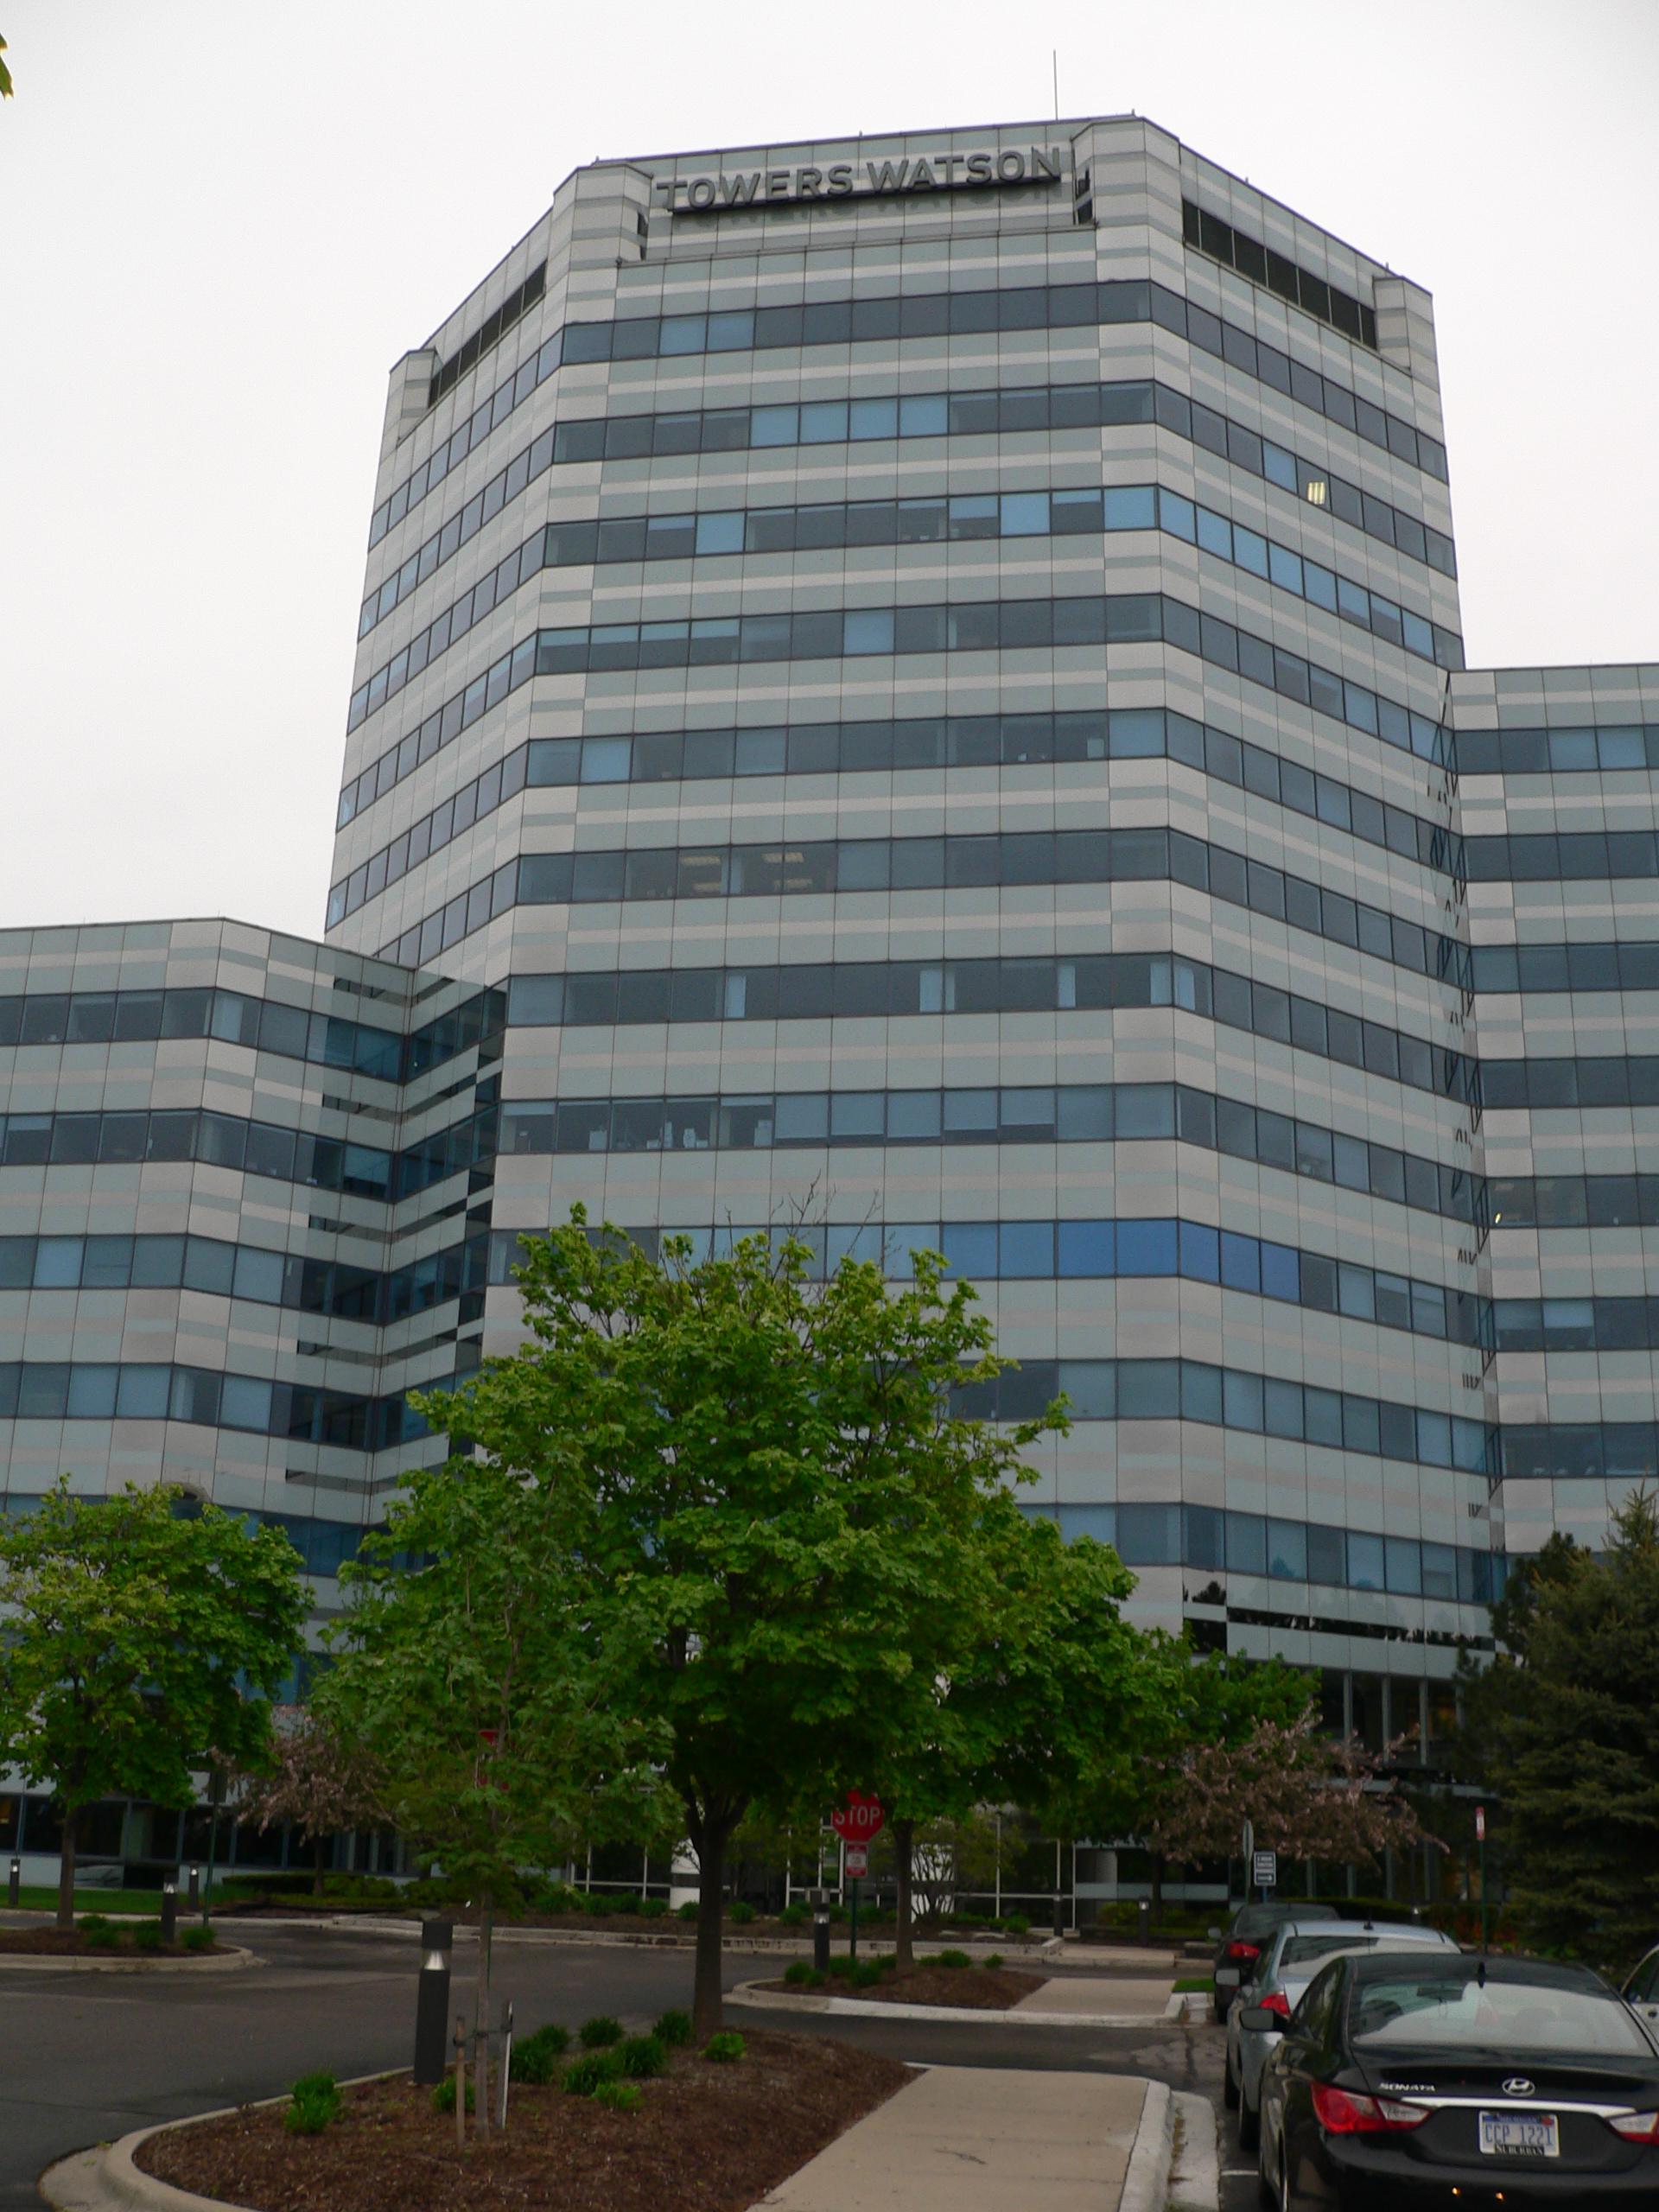 File:Towers Watson Southfield MI.JPG